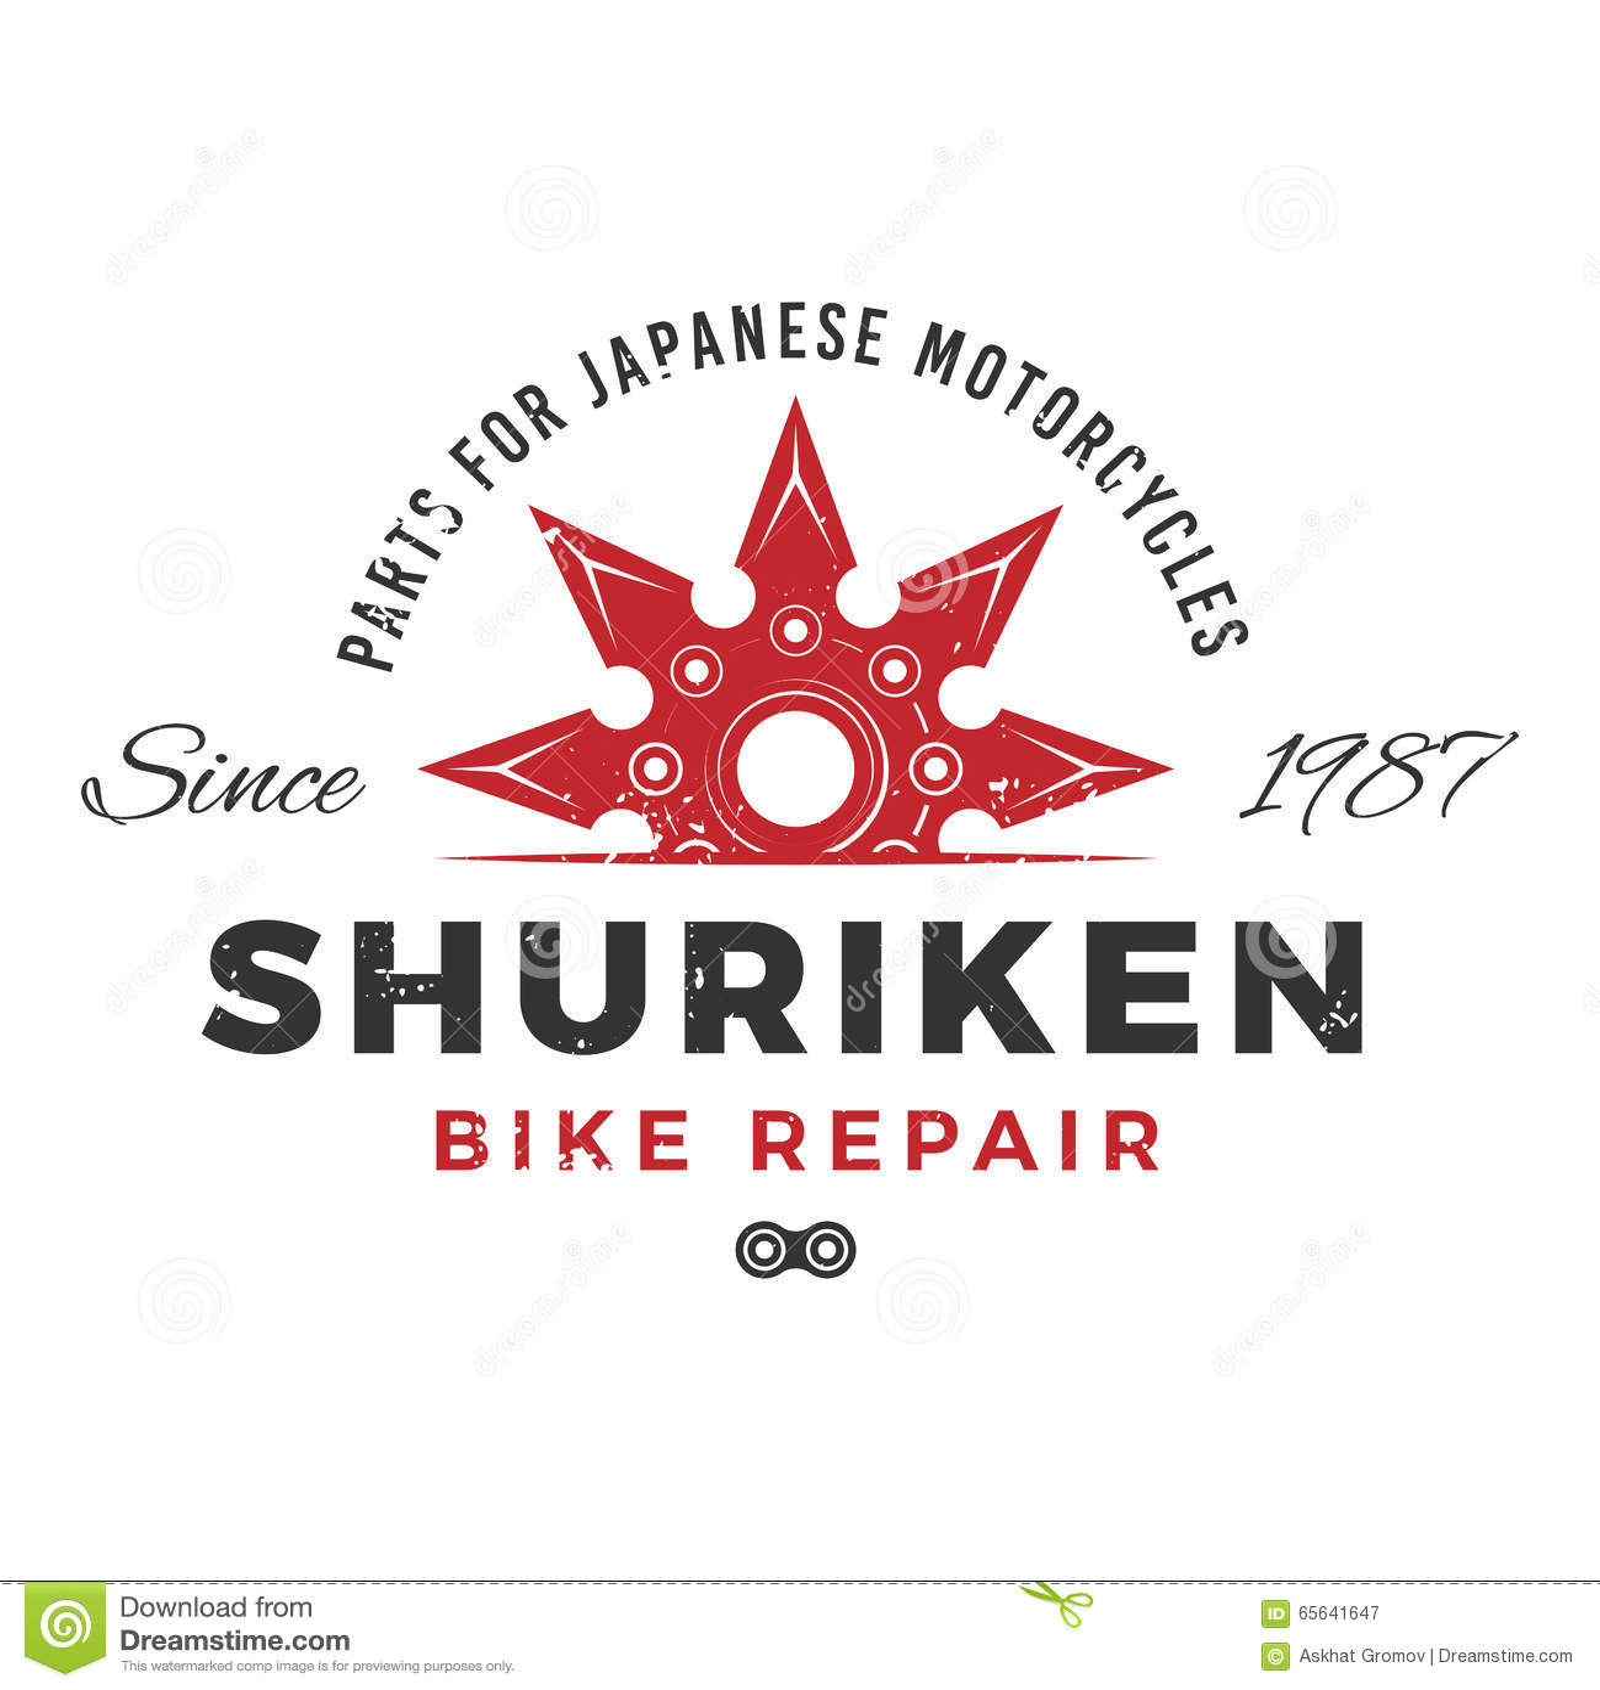 Design shirt japan - Japan Bike Repair Service Logo Concept Ninja Weapon Insignia Design Vintage Shuriken Badge